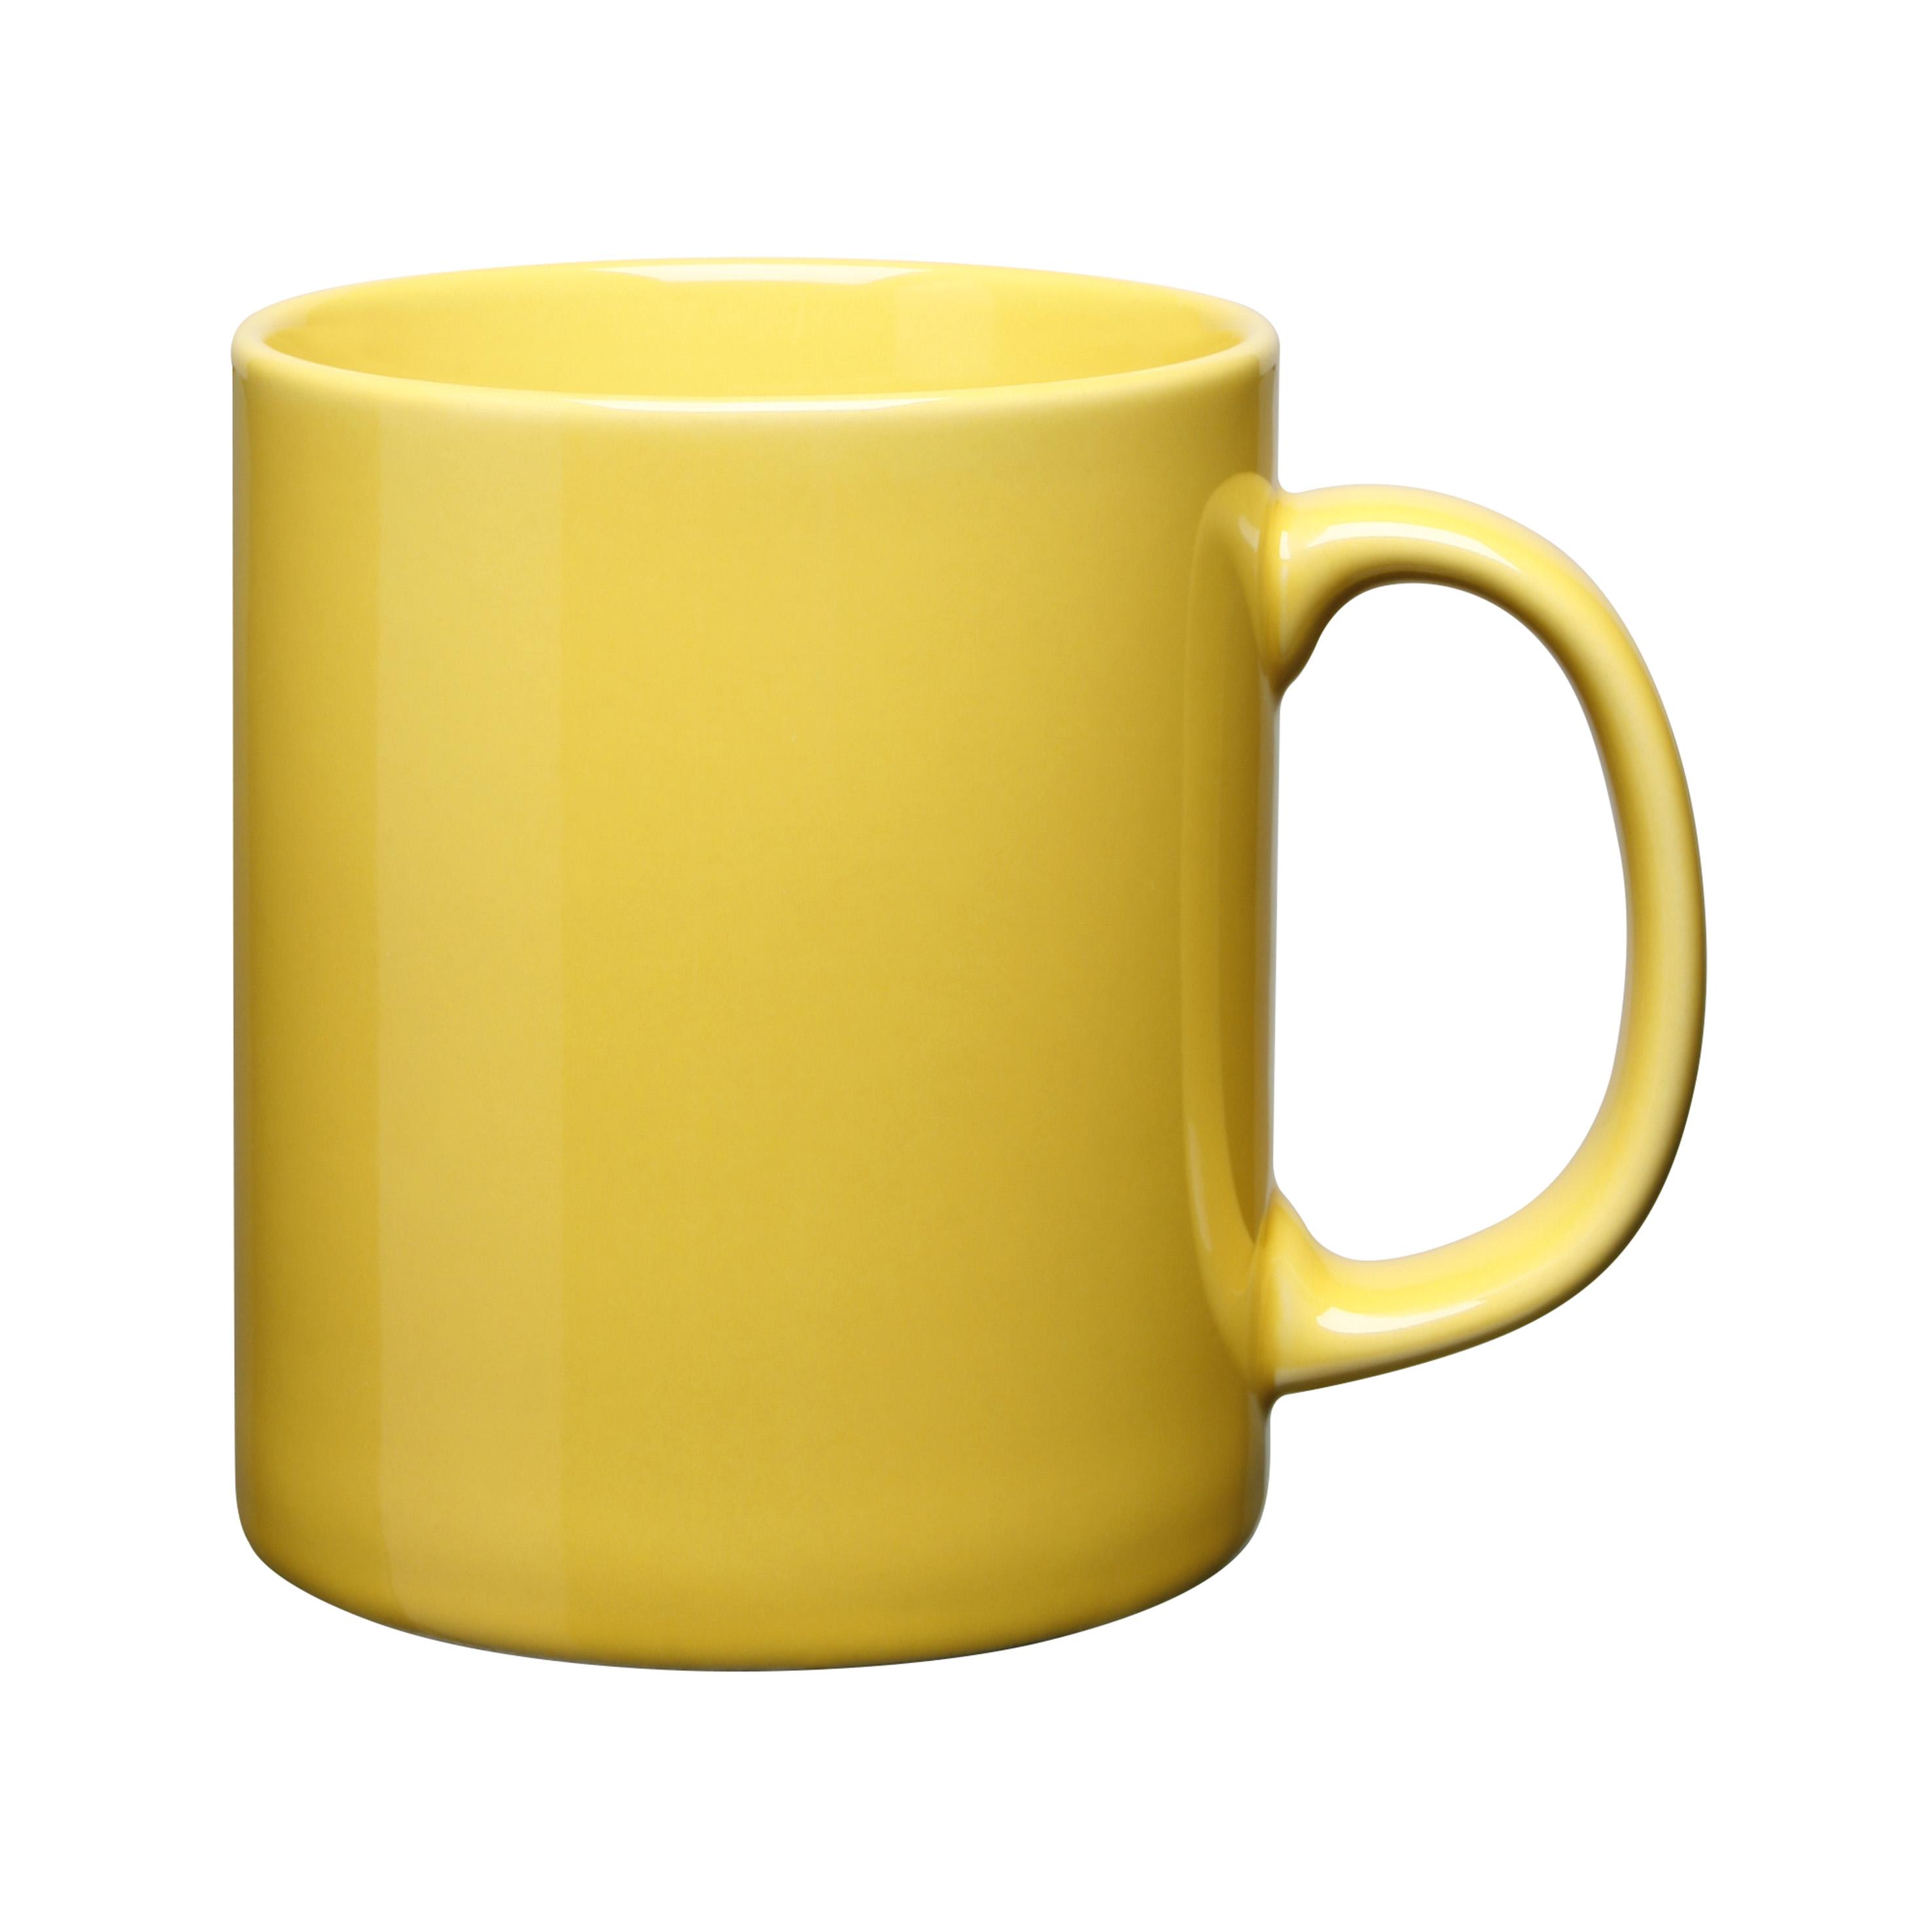 Promotional Cambridge Yellow